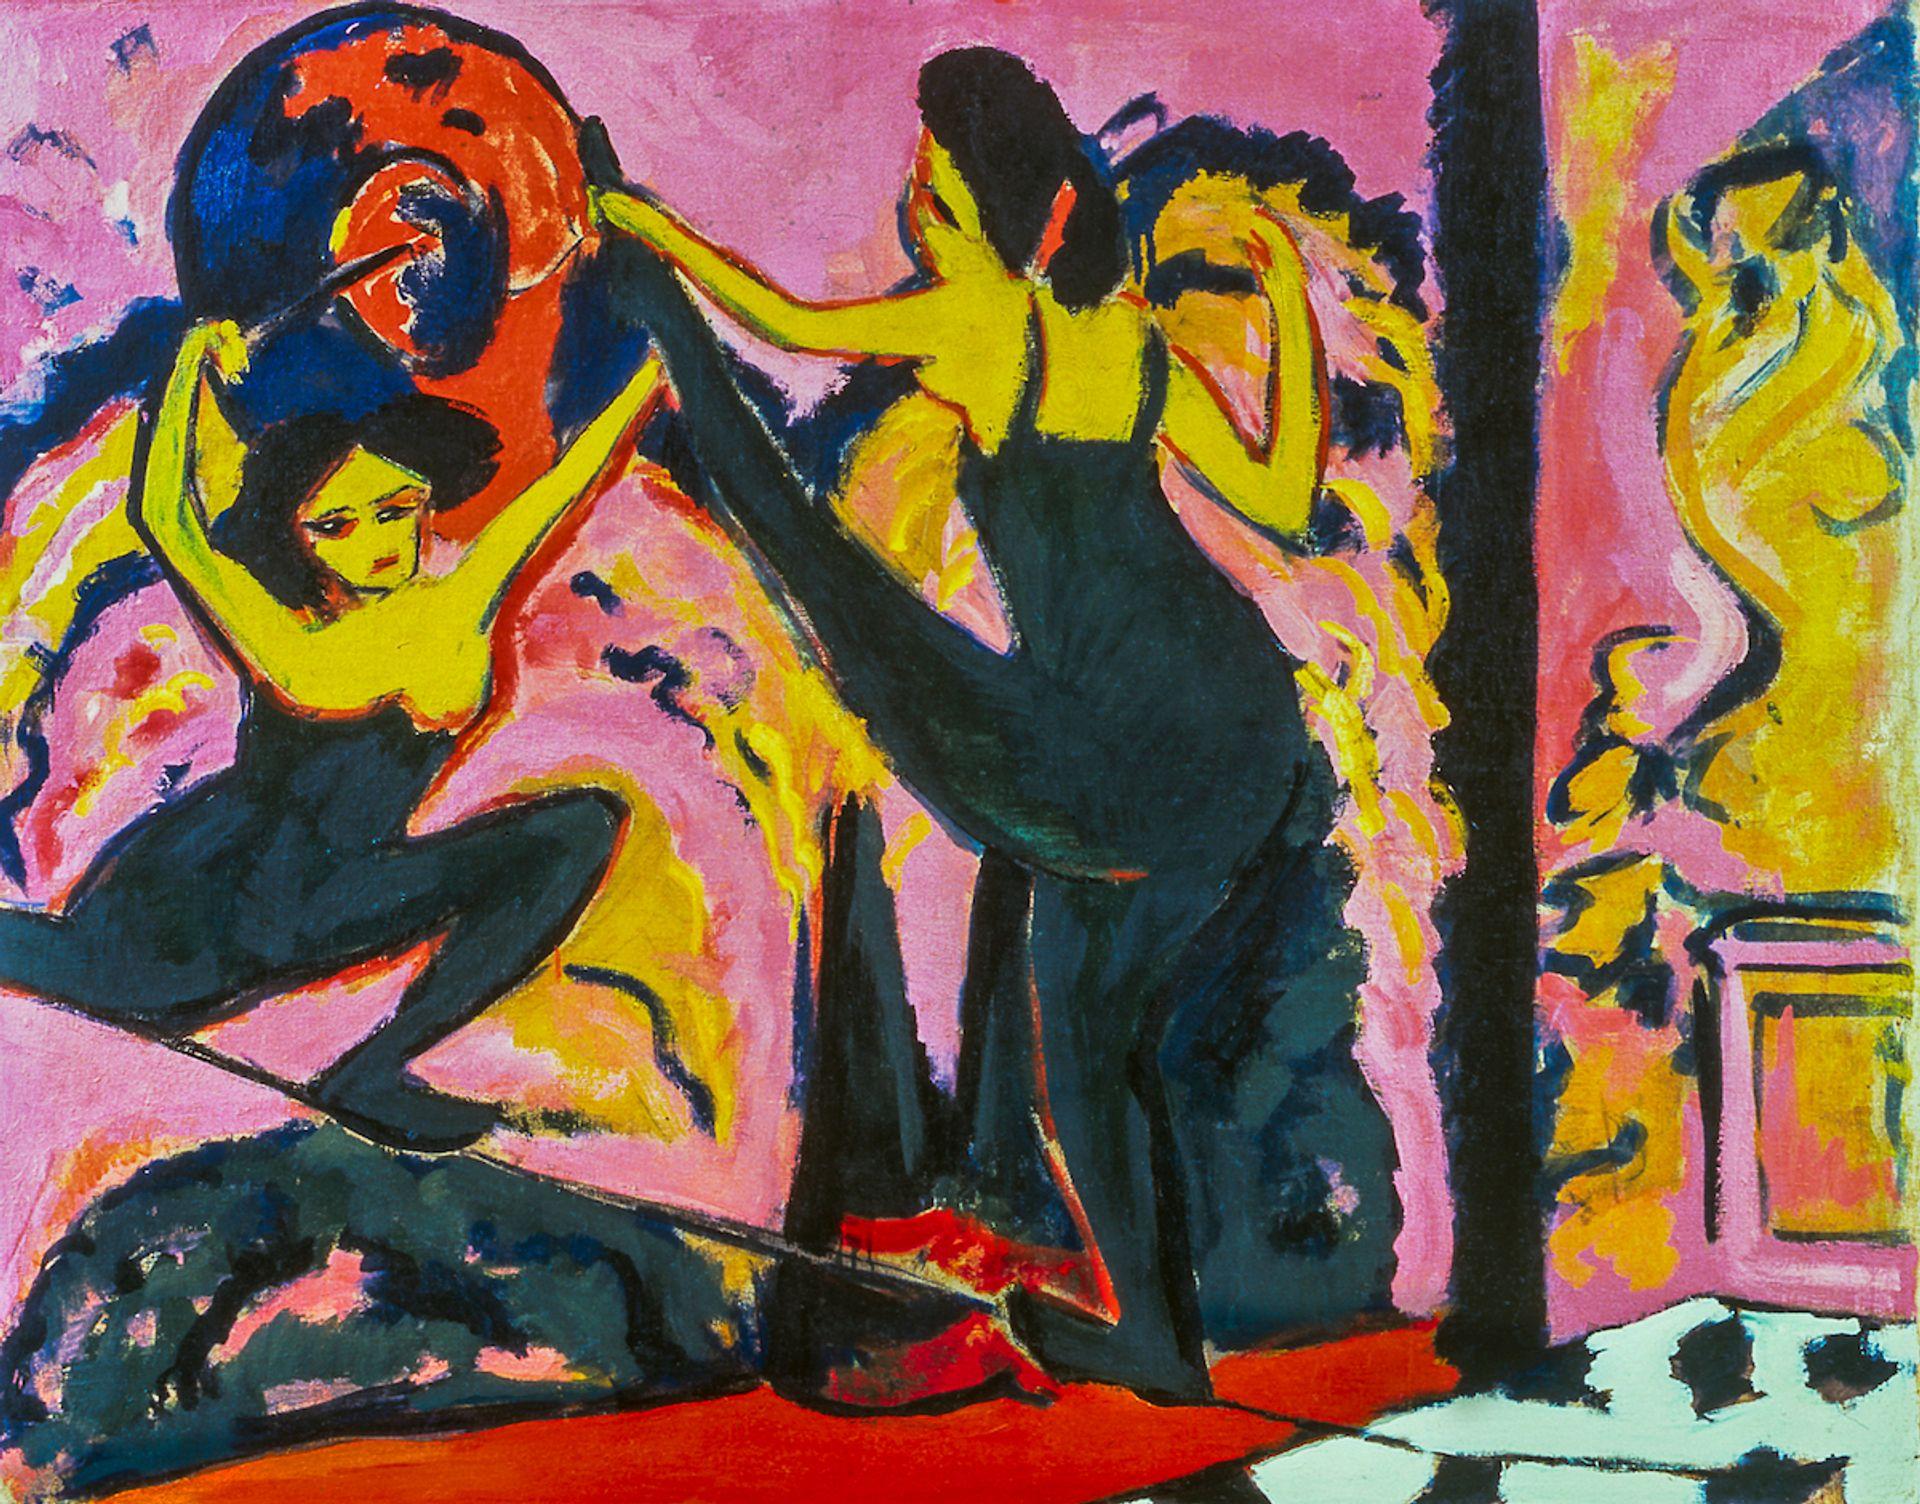 Ernst Ludwig Kirchner, Tightrope Walk, 1908-10 Neue Galerie New York